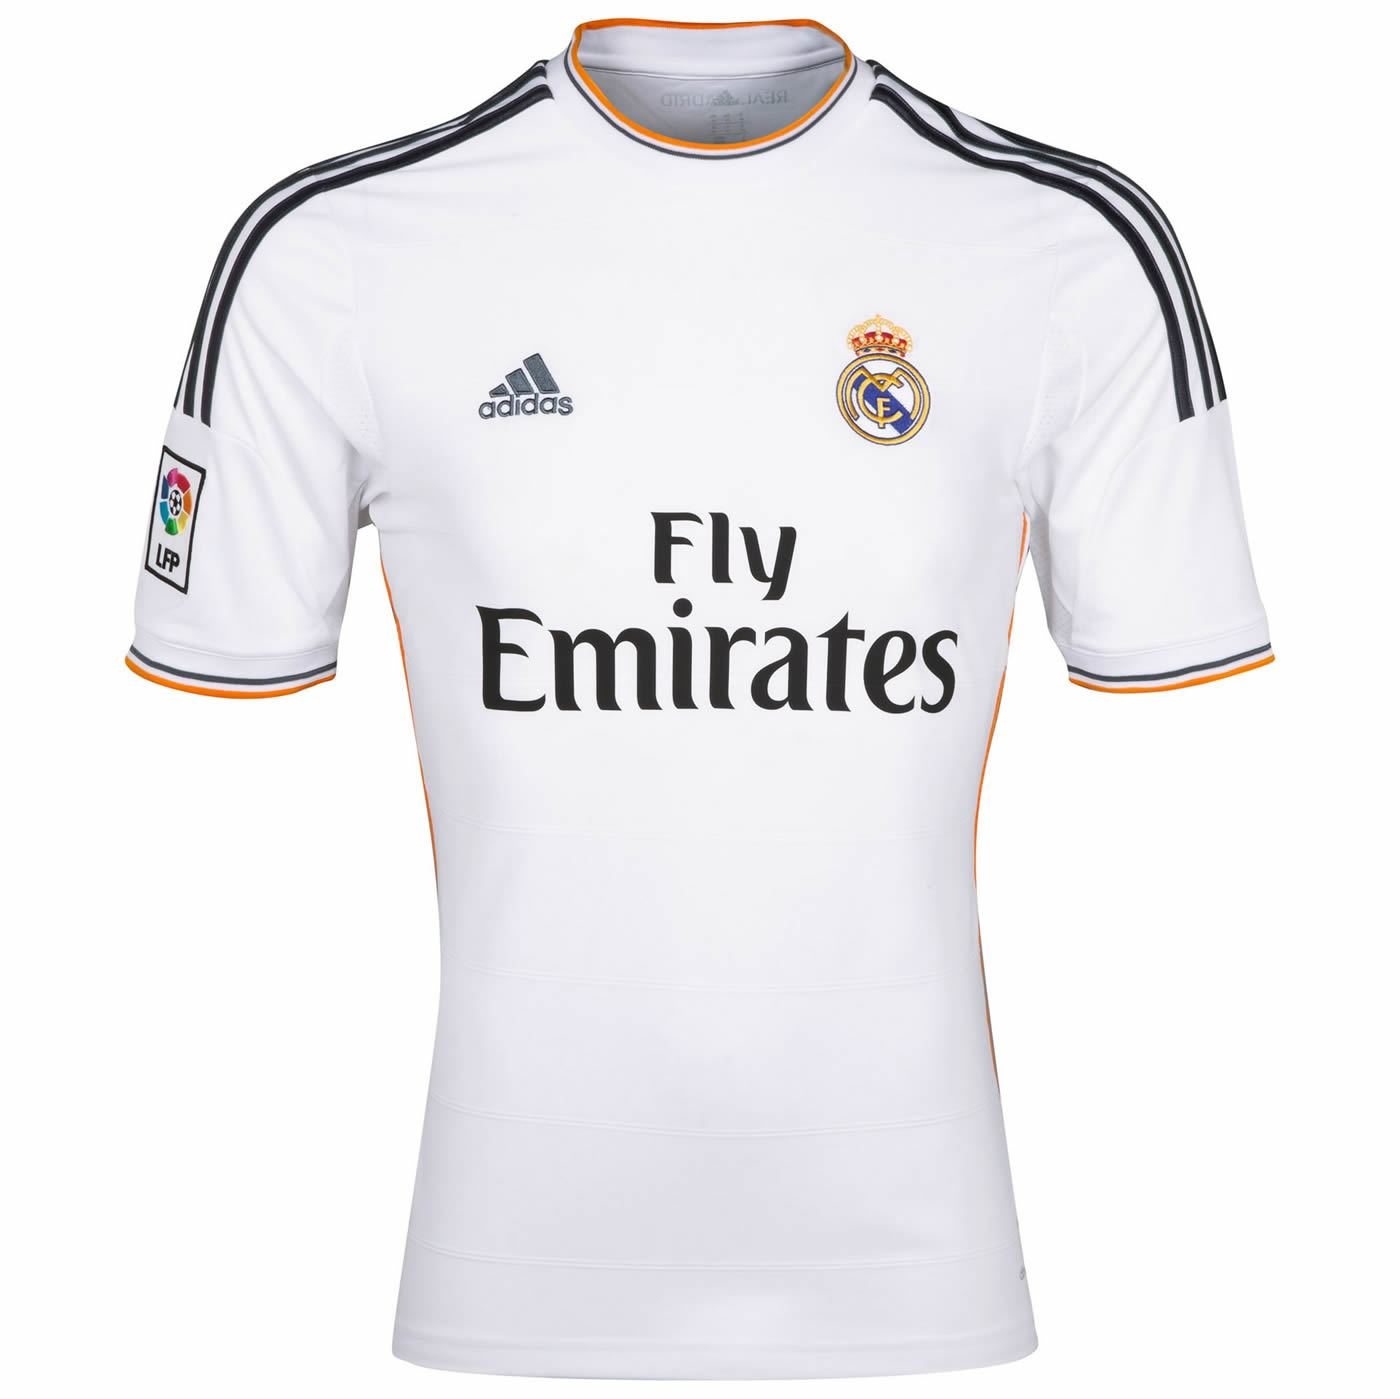 05b9bcfb31f32 Camisetas Adidas del Real Madrid 2013 14